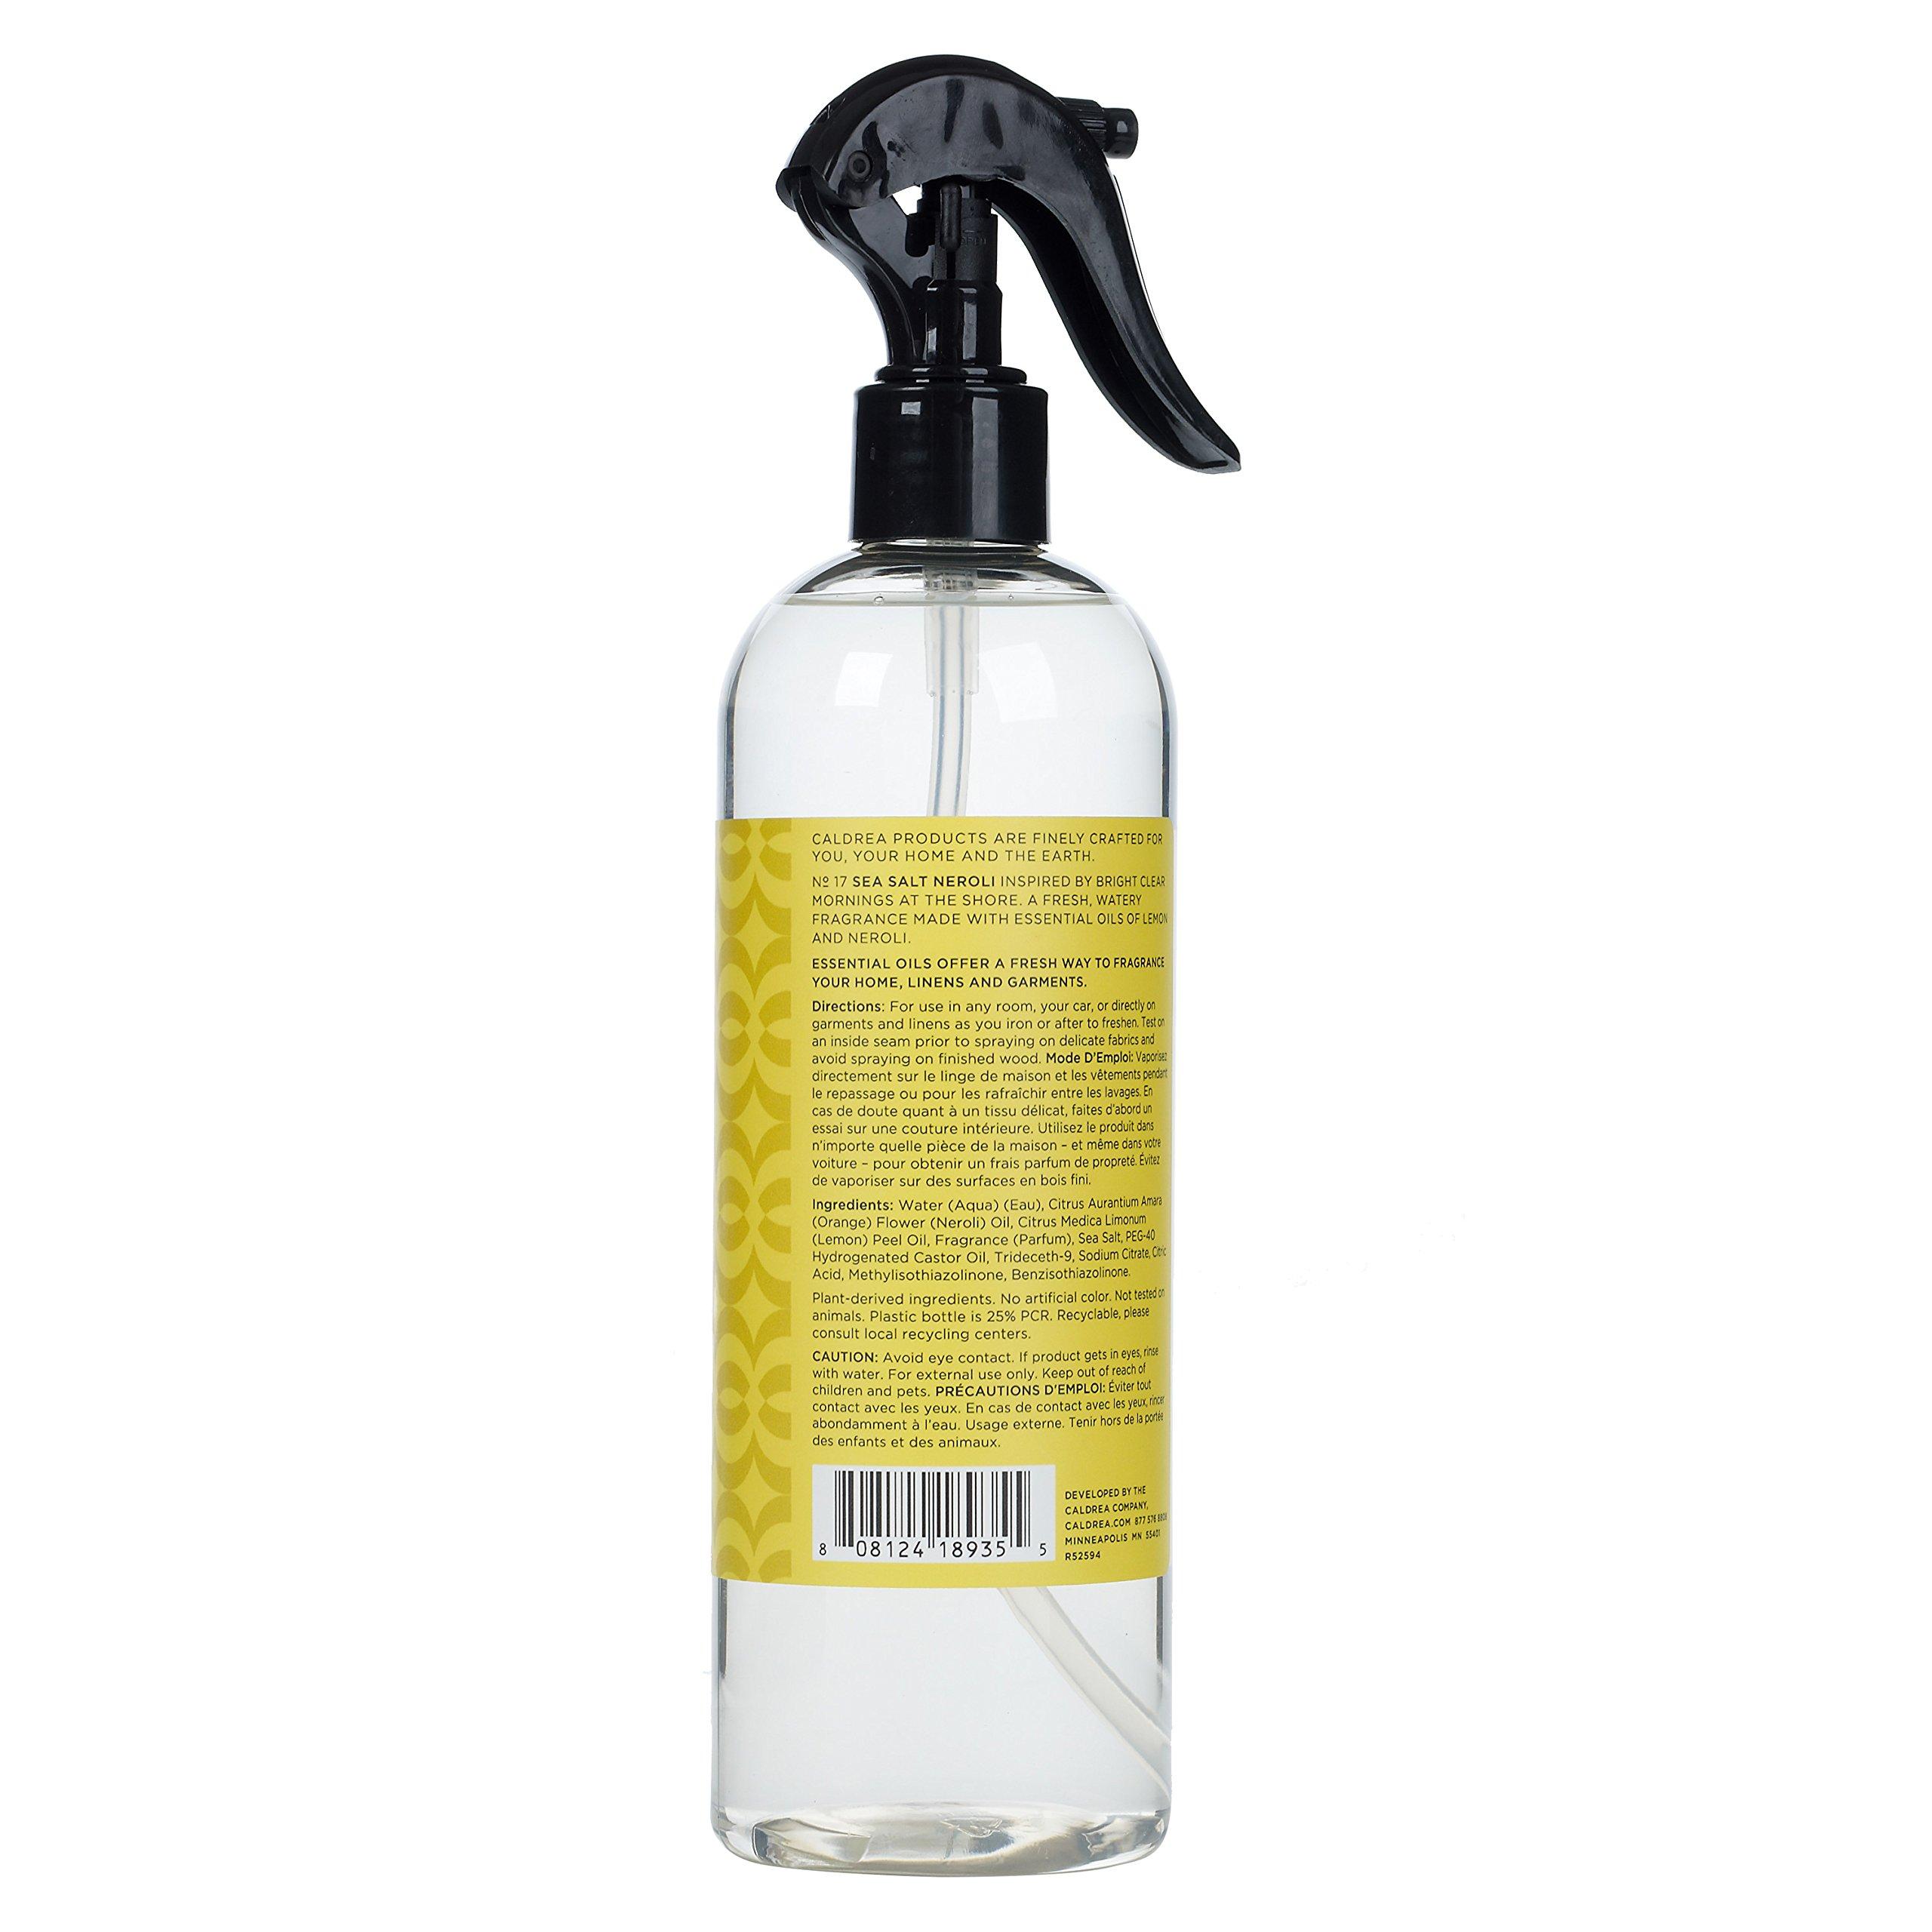 Caldrea Sea Salt Neroli Linen and Room Spray Air Freshener 16 oz by Caldrea (Image #2)